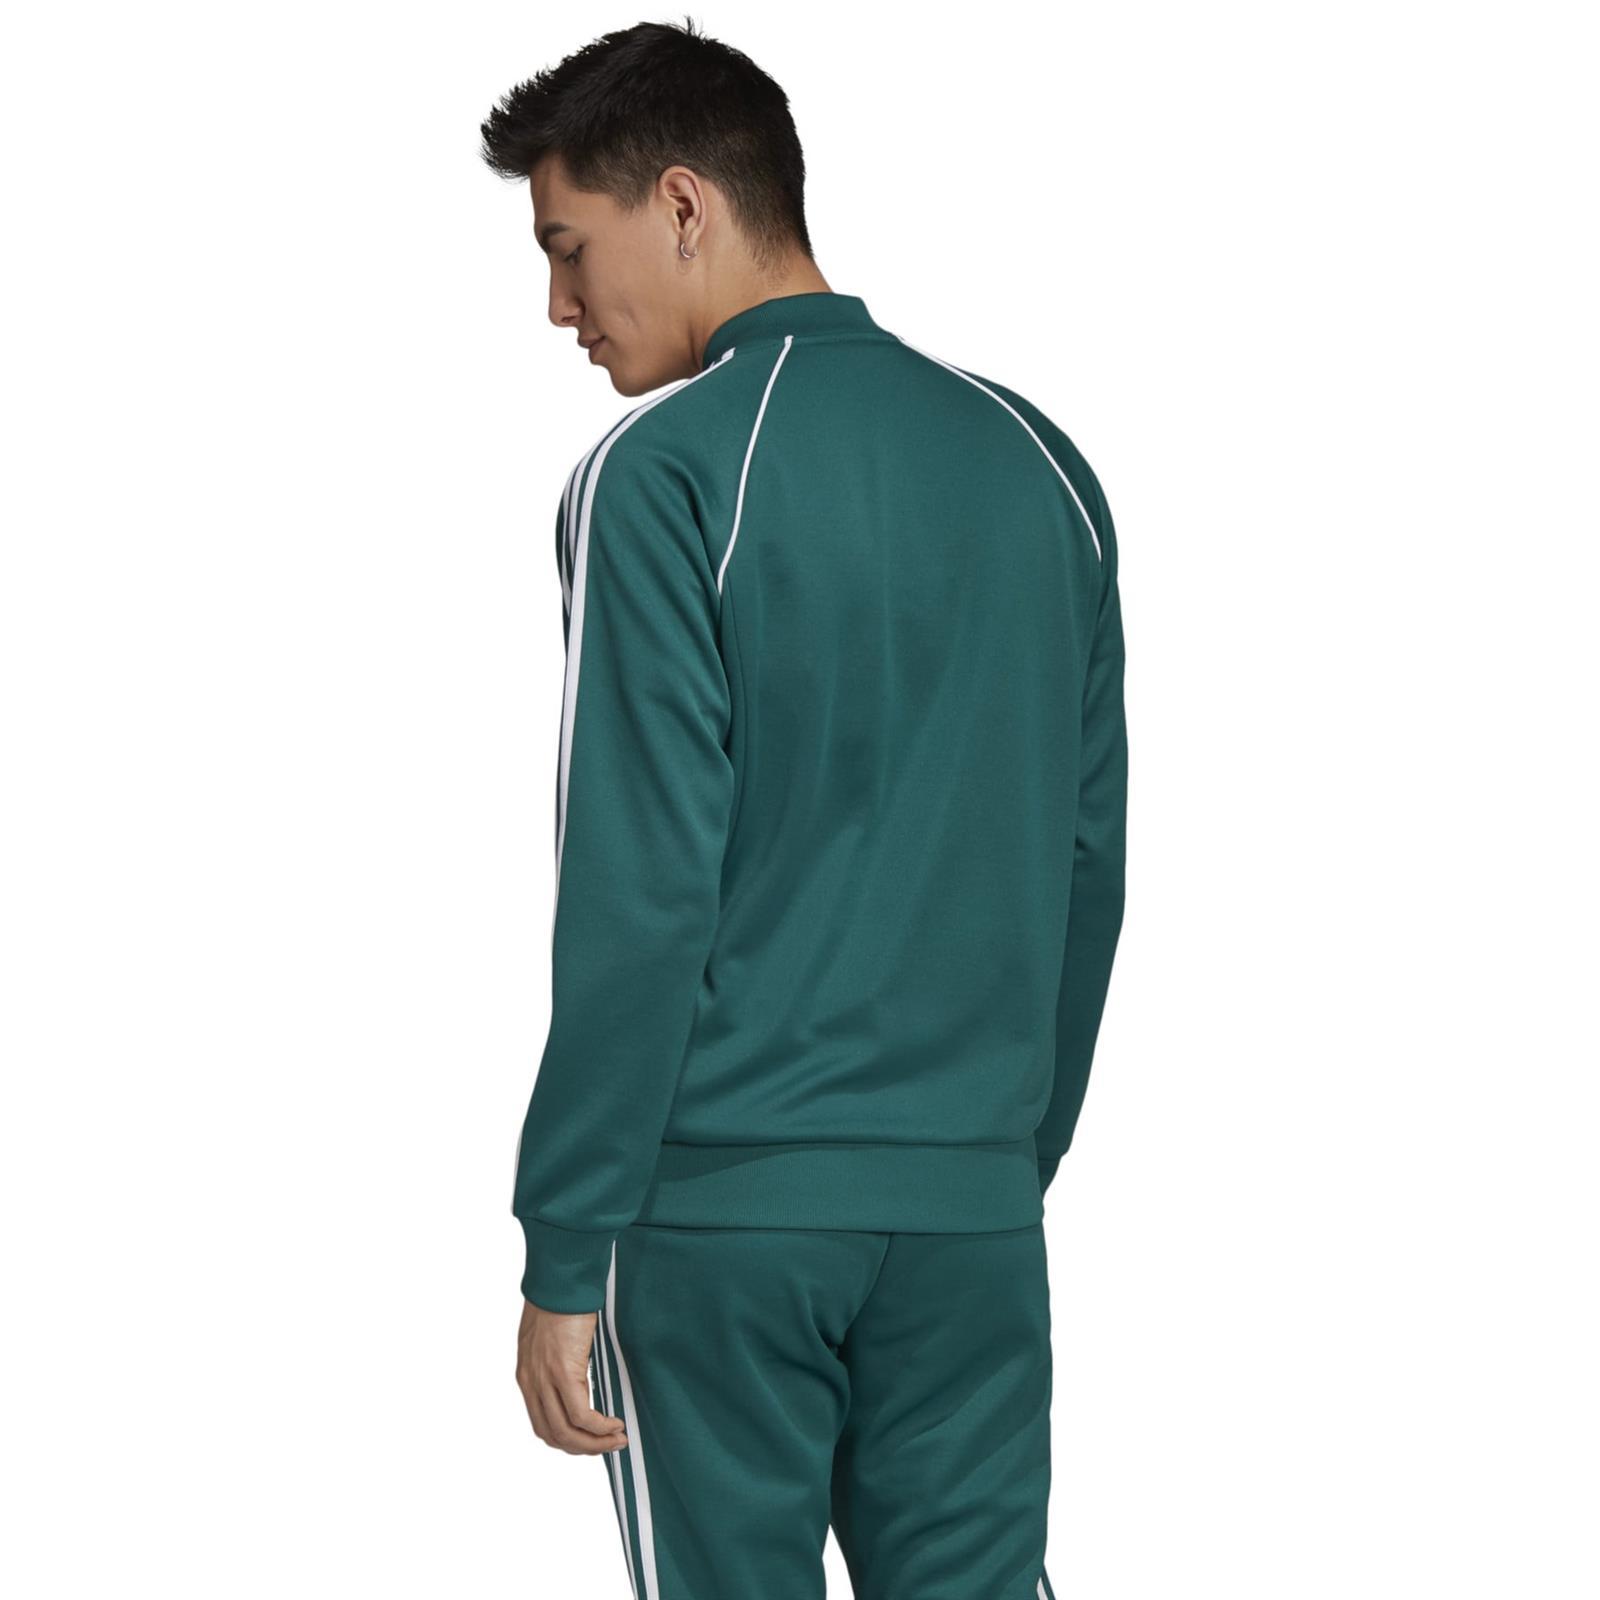 Bluza dresowa adidas SST EJ9683